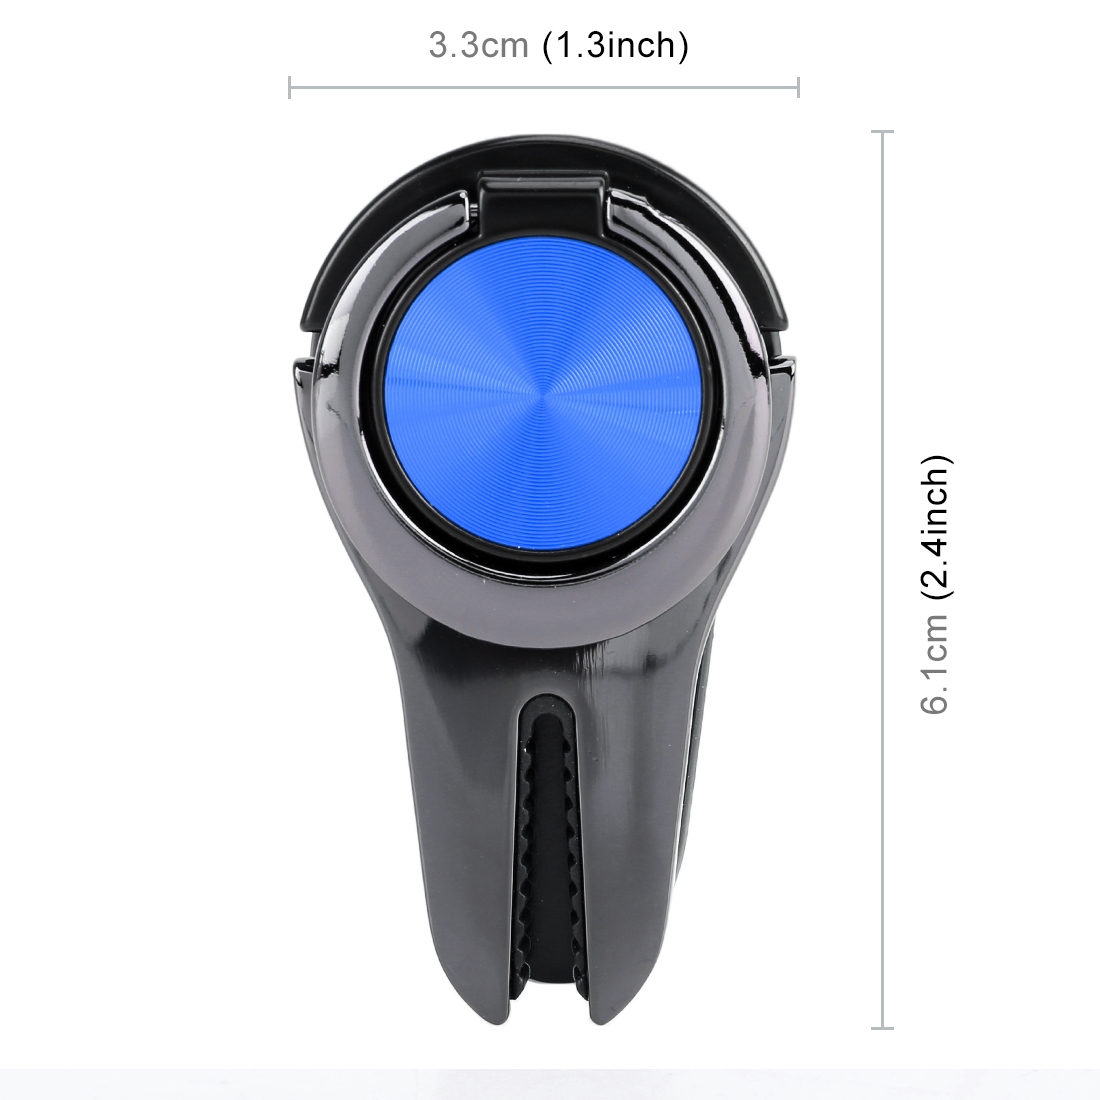 Universal Magnetic Car Air Vent Mount Phone Holder, Car Air Vent Mount Universal Ring Phone Holder (Blue)